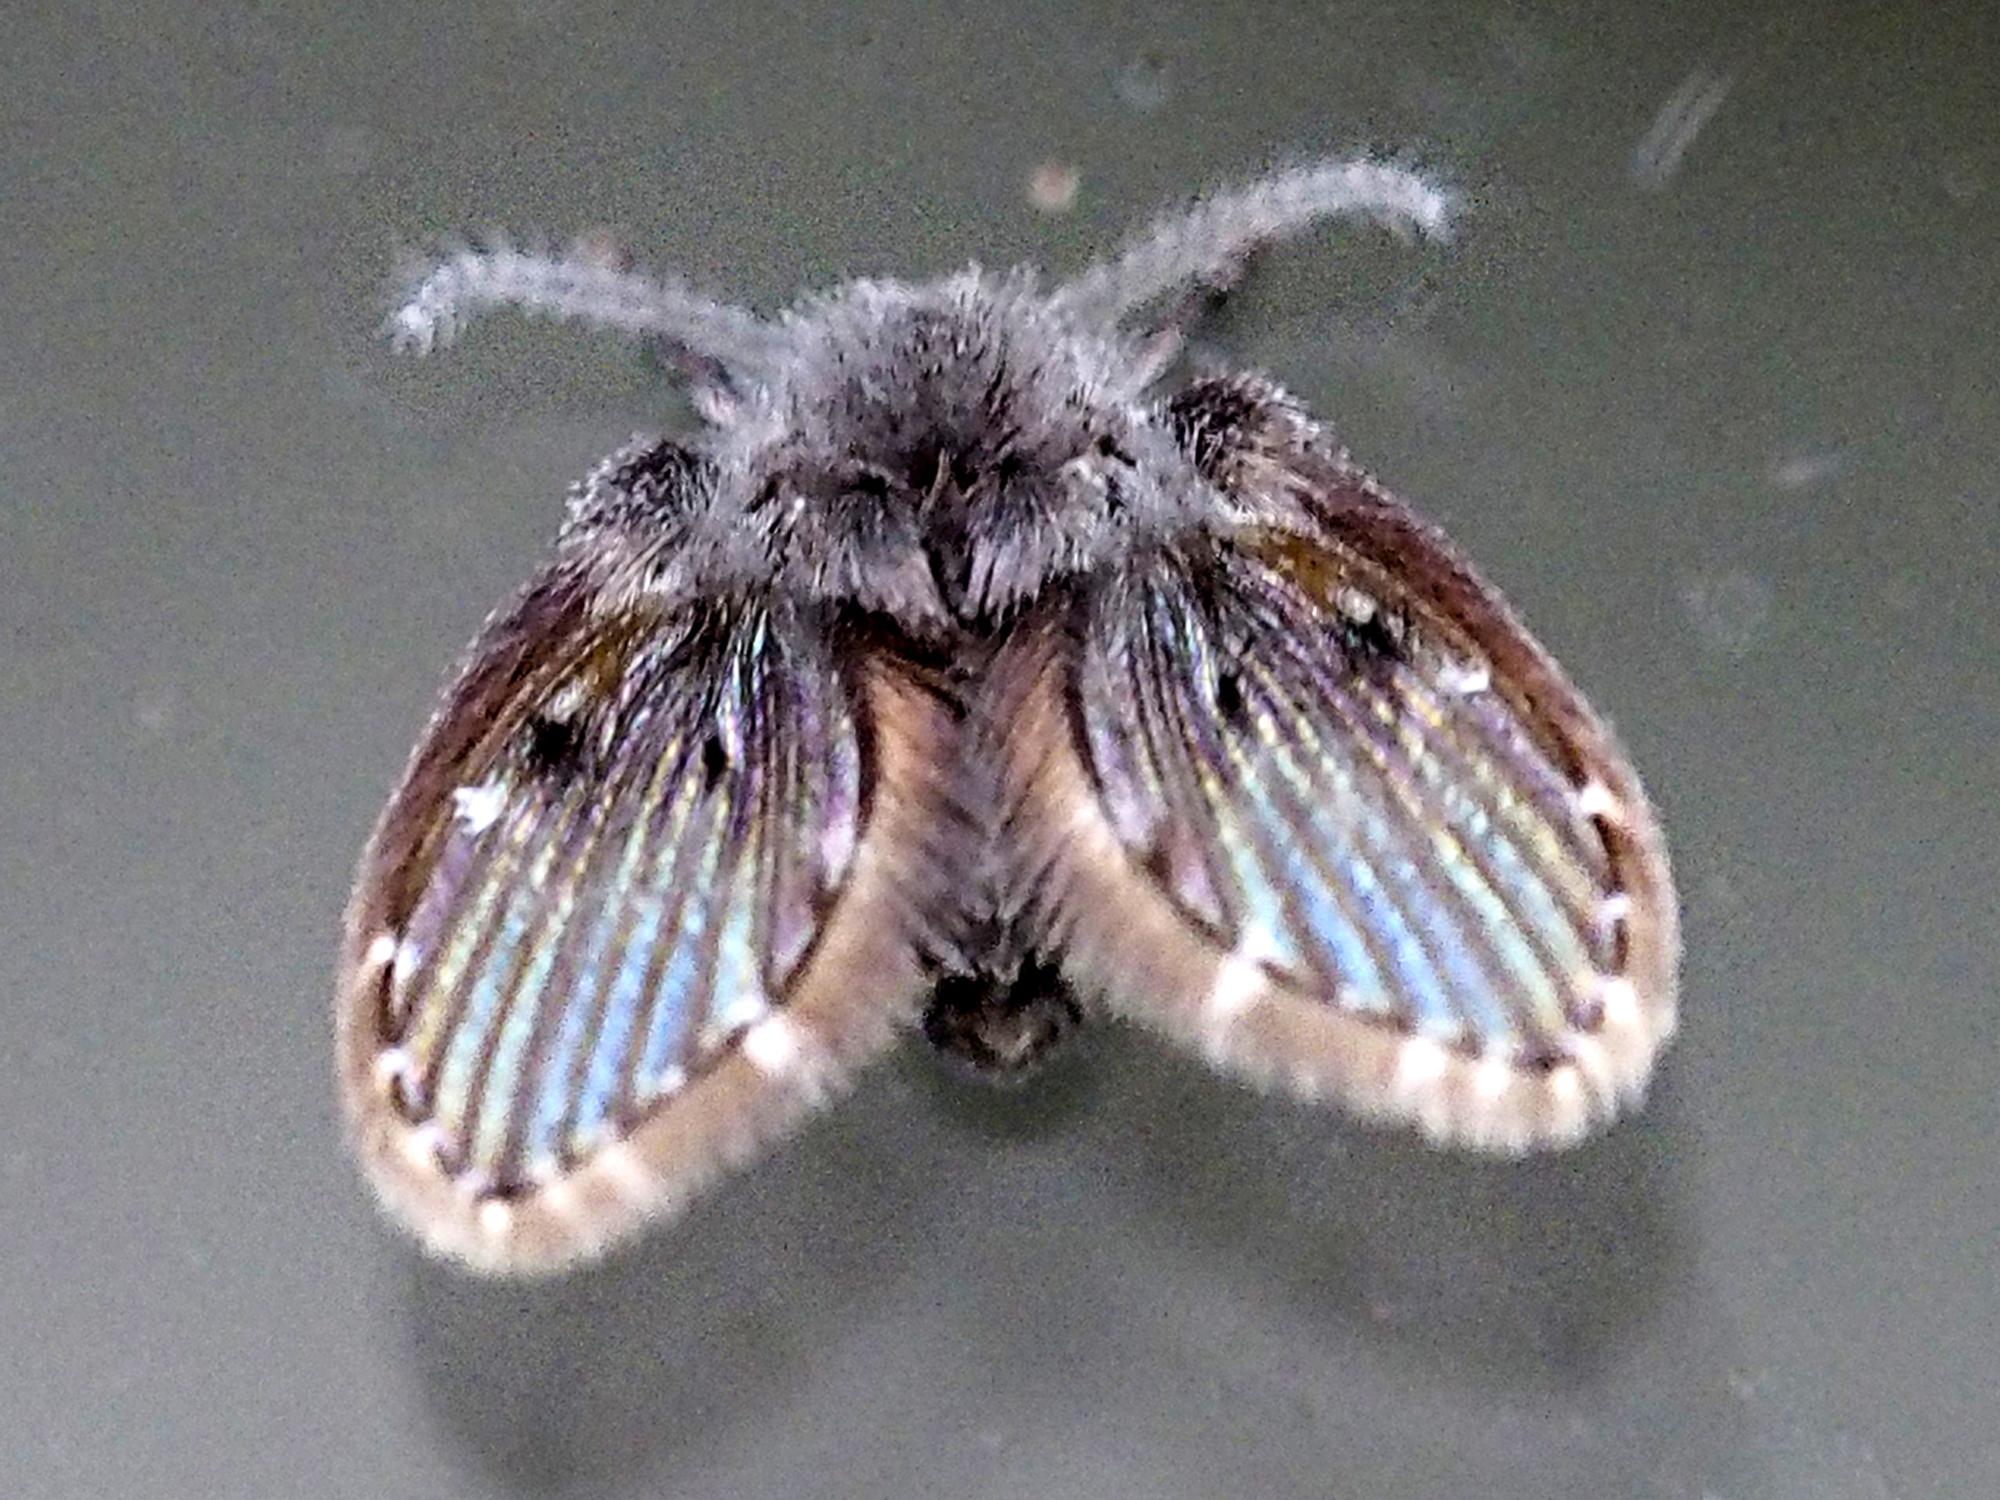 Schmetterlingsmücke, Pericoma, CC-BY-SA 4.0, Rolf Pflugshaupt, Gümligen, switzerland